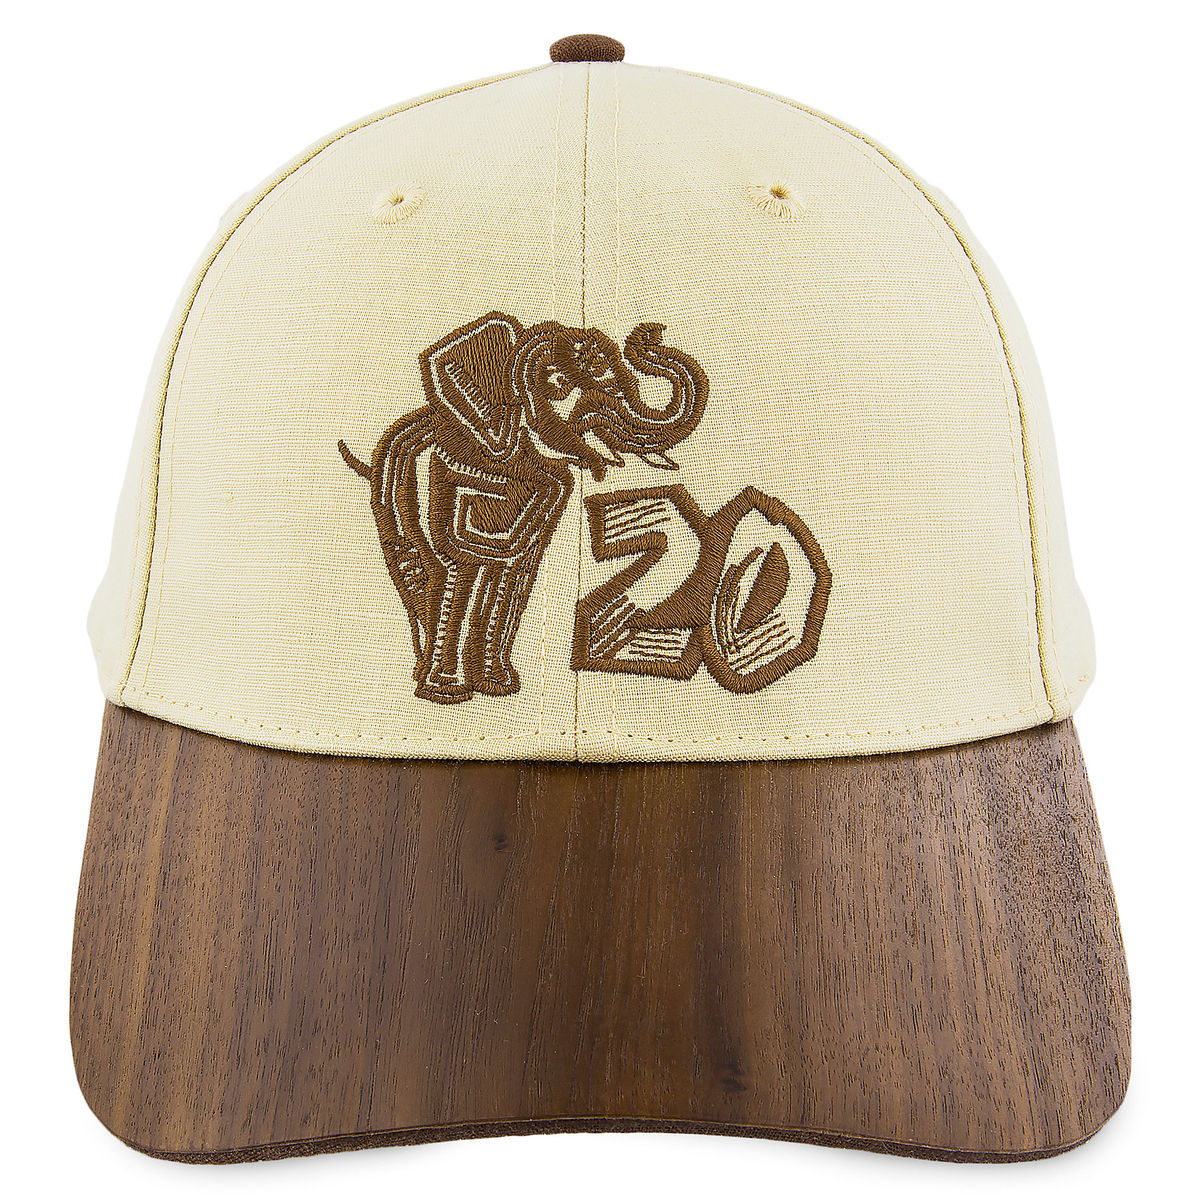 Product Image of Disney s Animal Kingdom 20th Anniversary Baseball Ball Cap  for Adults   1 34362183192